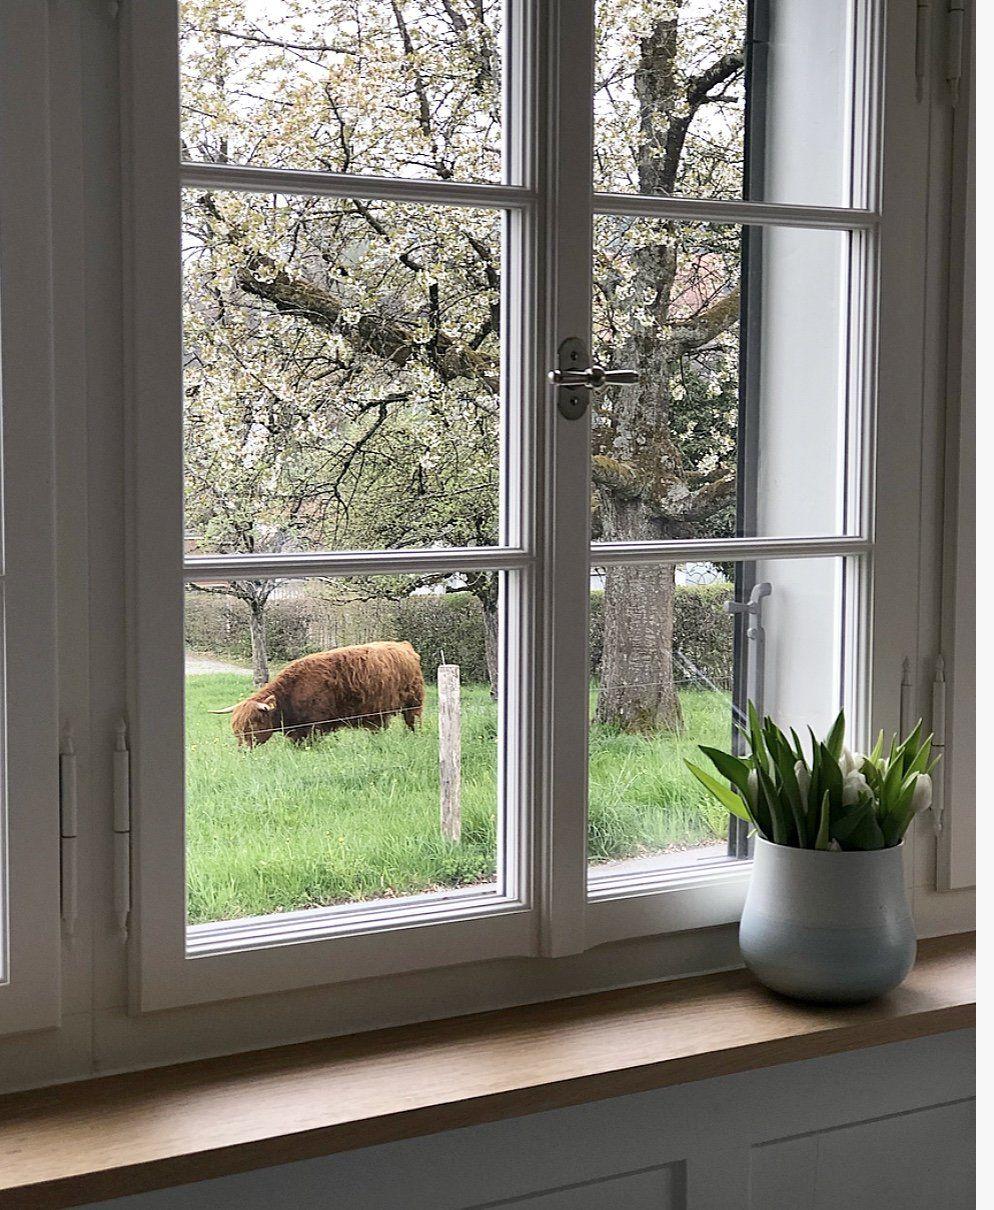 Deko Fensterbank Deko Fur Fensterbanke Innen Fensterbank: Die Schönsten Ideen Für Die Fensterbank & Fensterbrett Deko